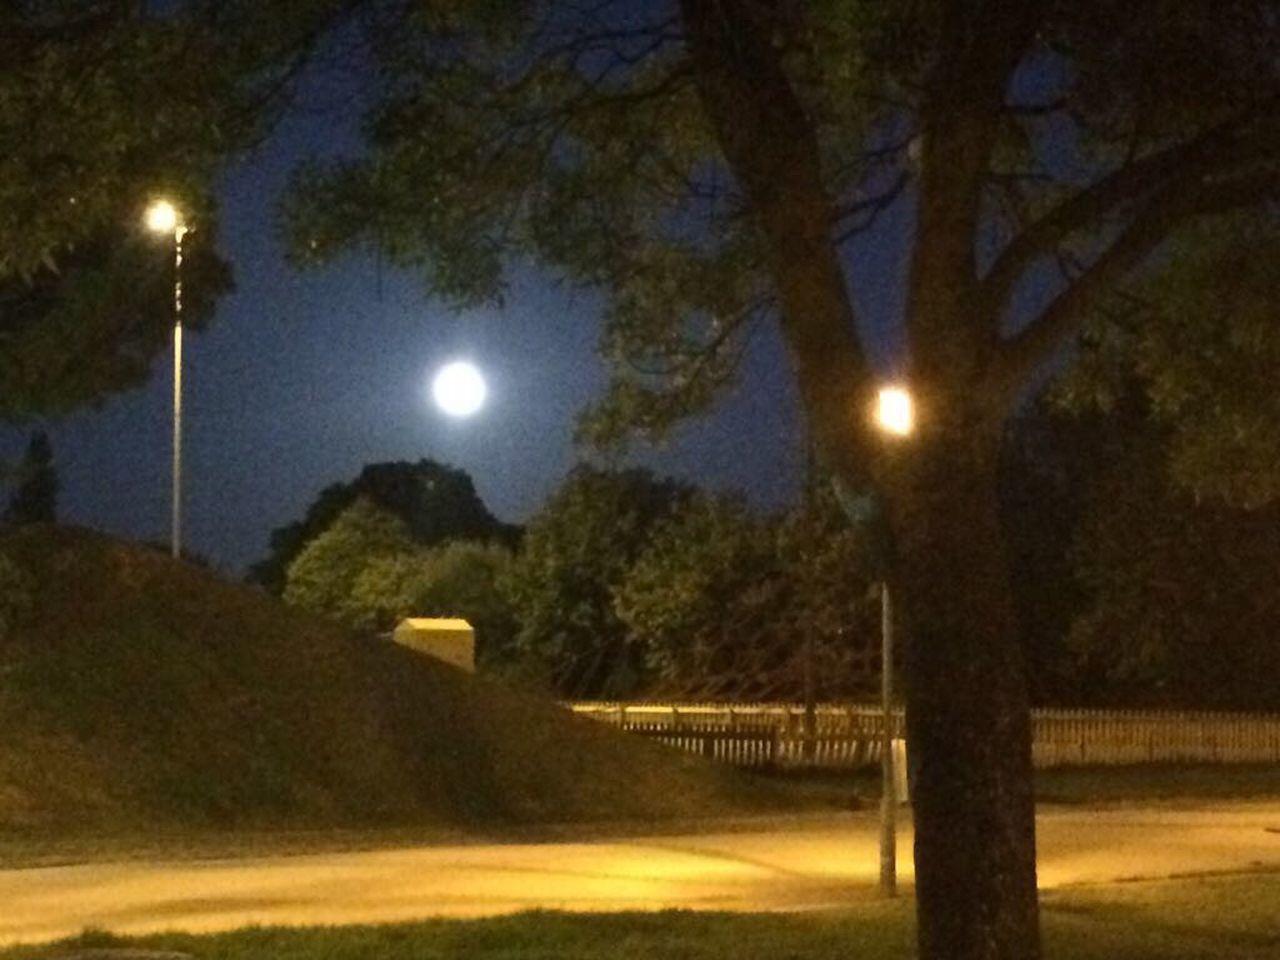 night, moon, illuminated, street light, tree, nature, beauty in nature, outdoors, tranquility, moonlight, tranquil scene, no people, astronomy, sky